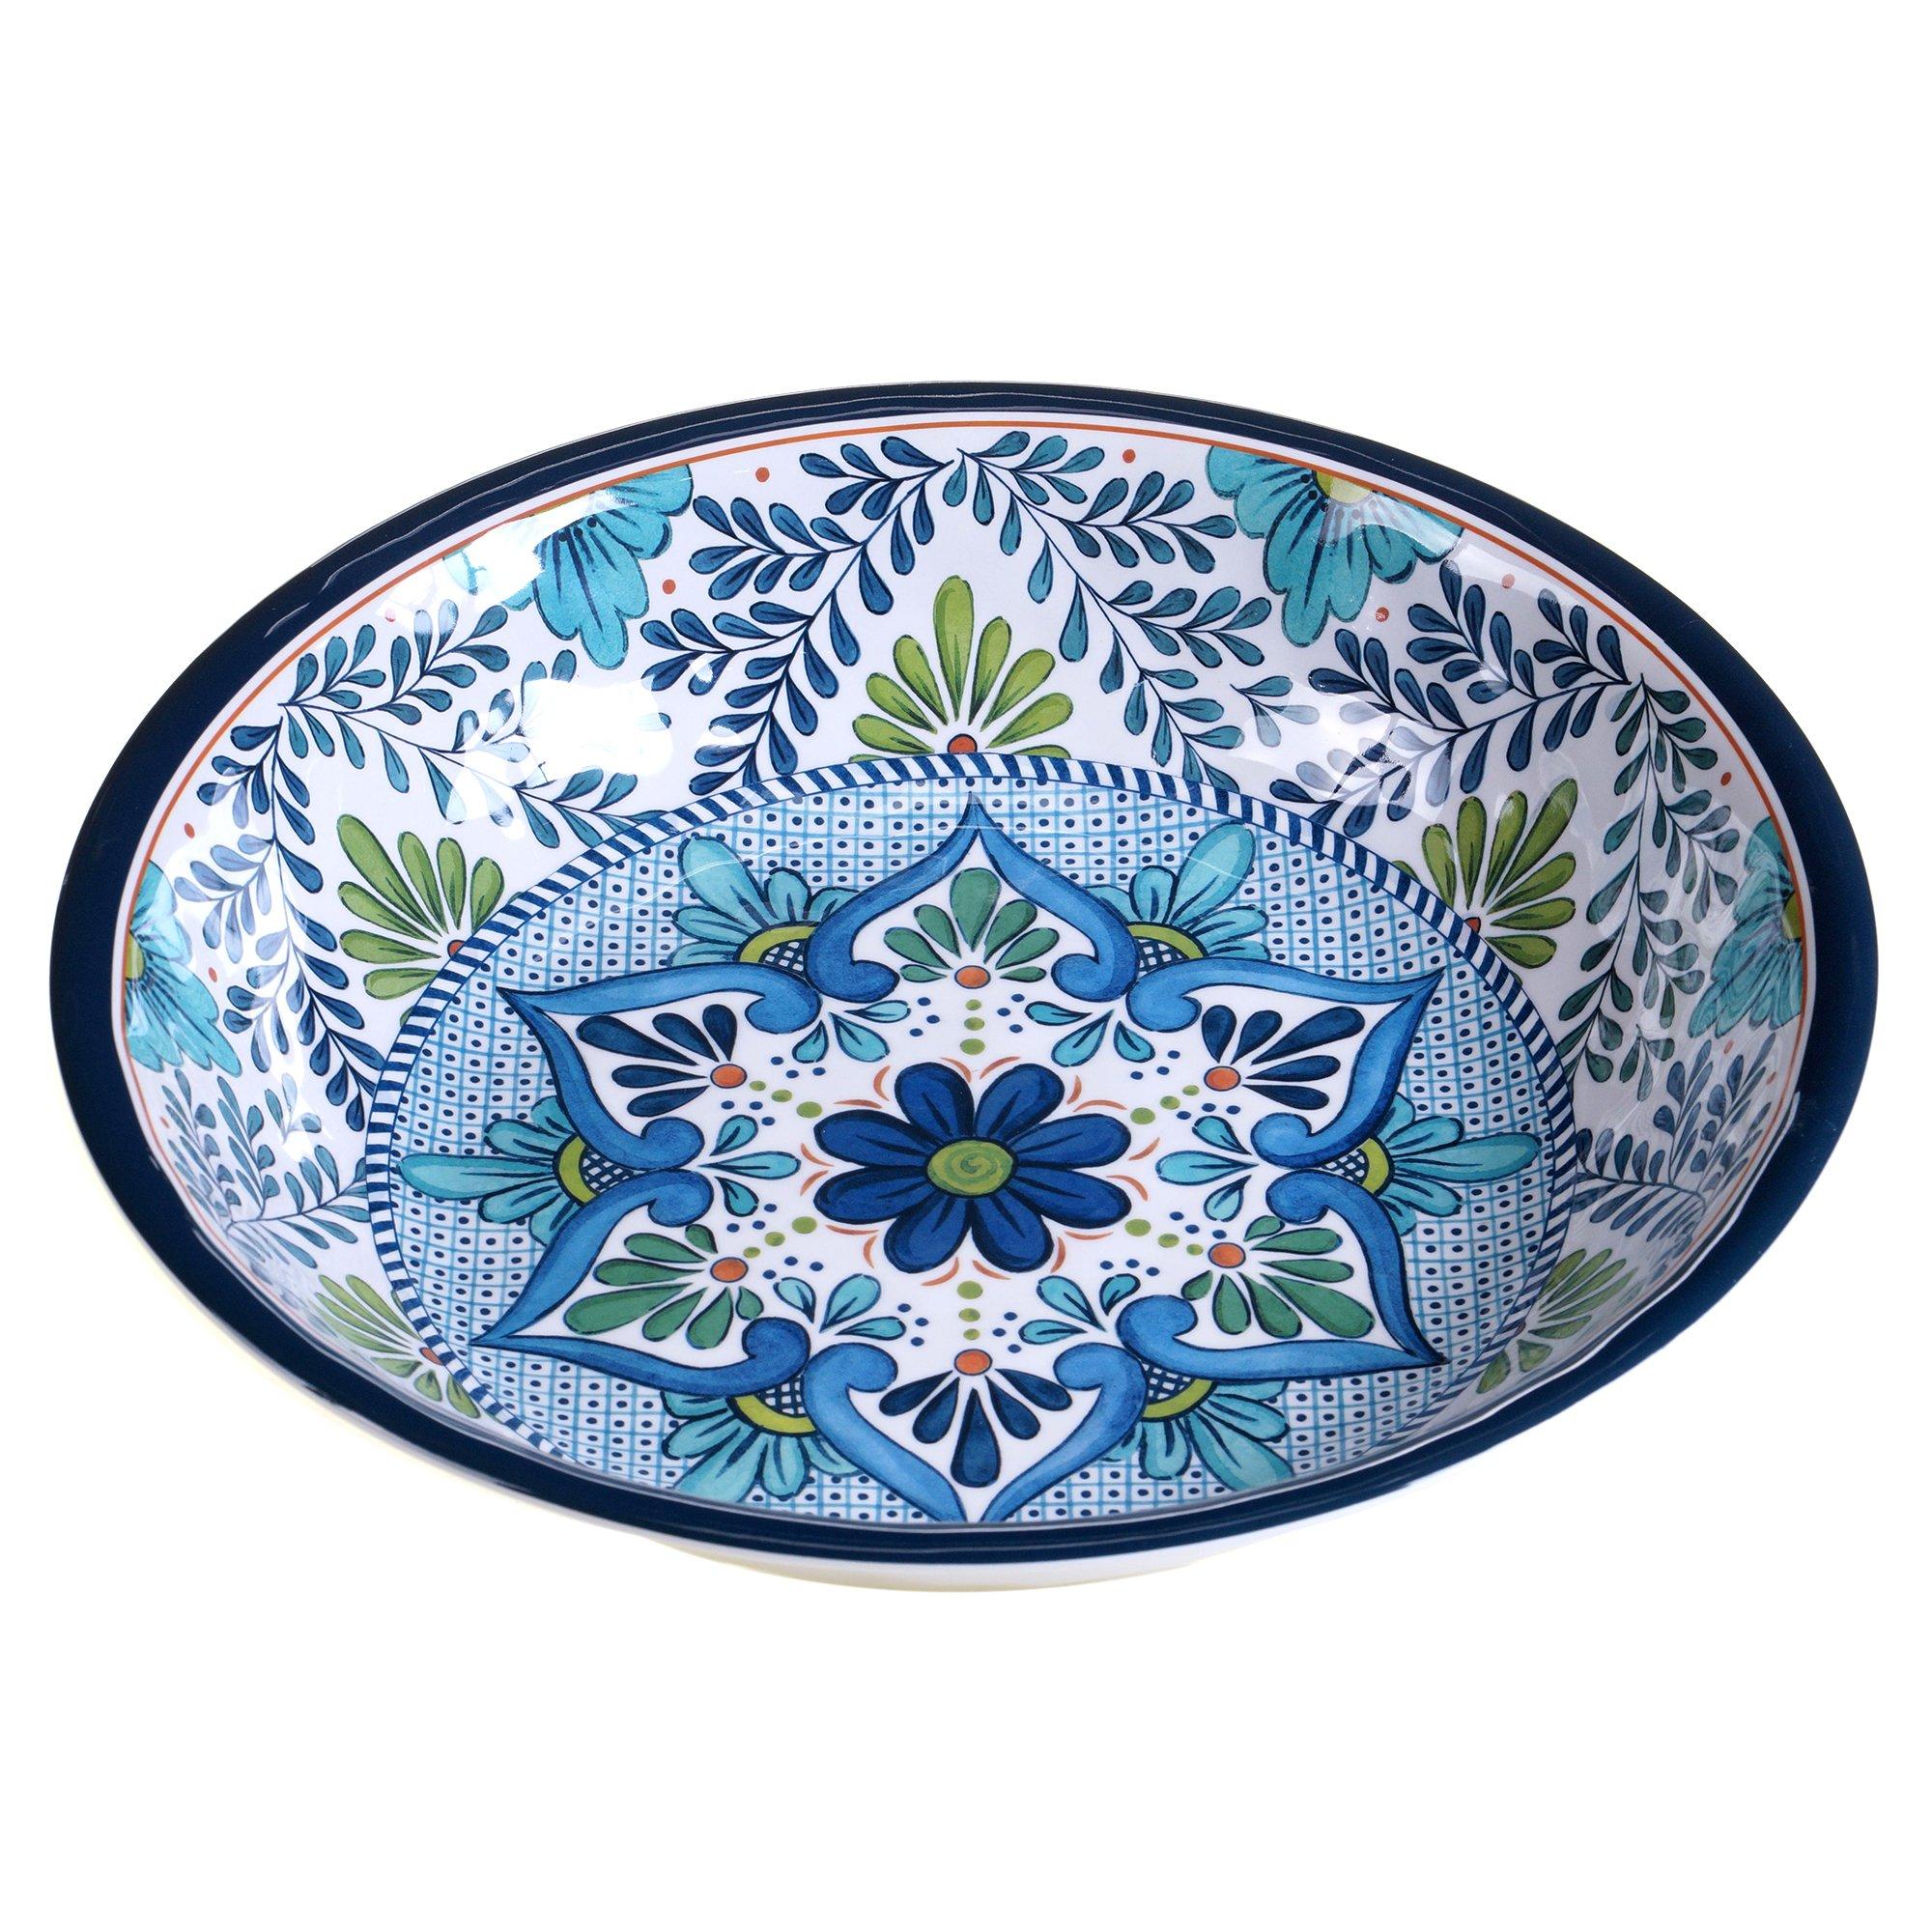 Certified International Talavera Melamine 13.75'' x 2.75'' Large Serving Bowl, Multicolor